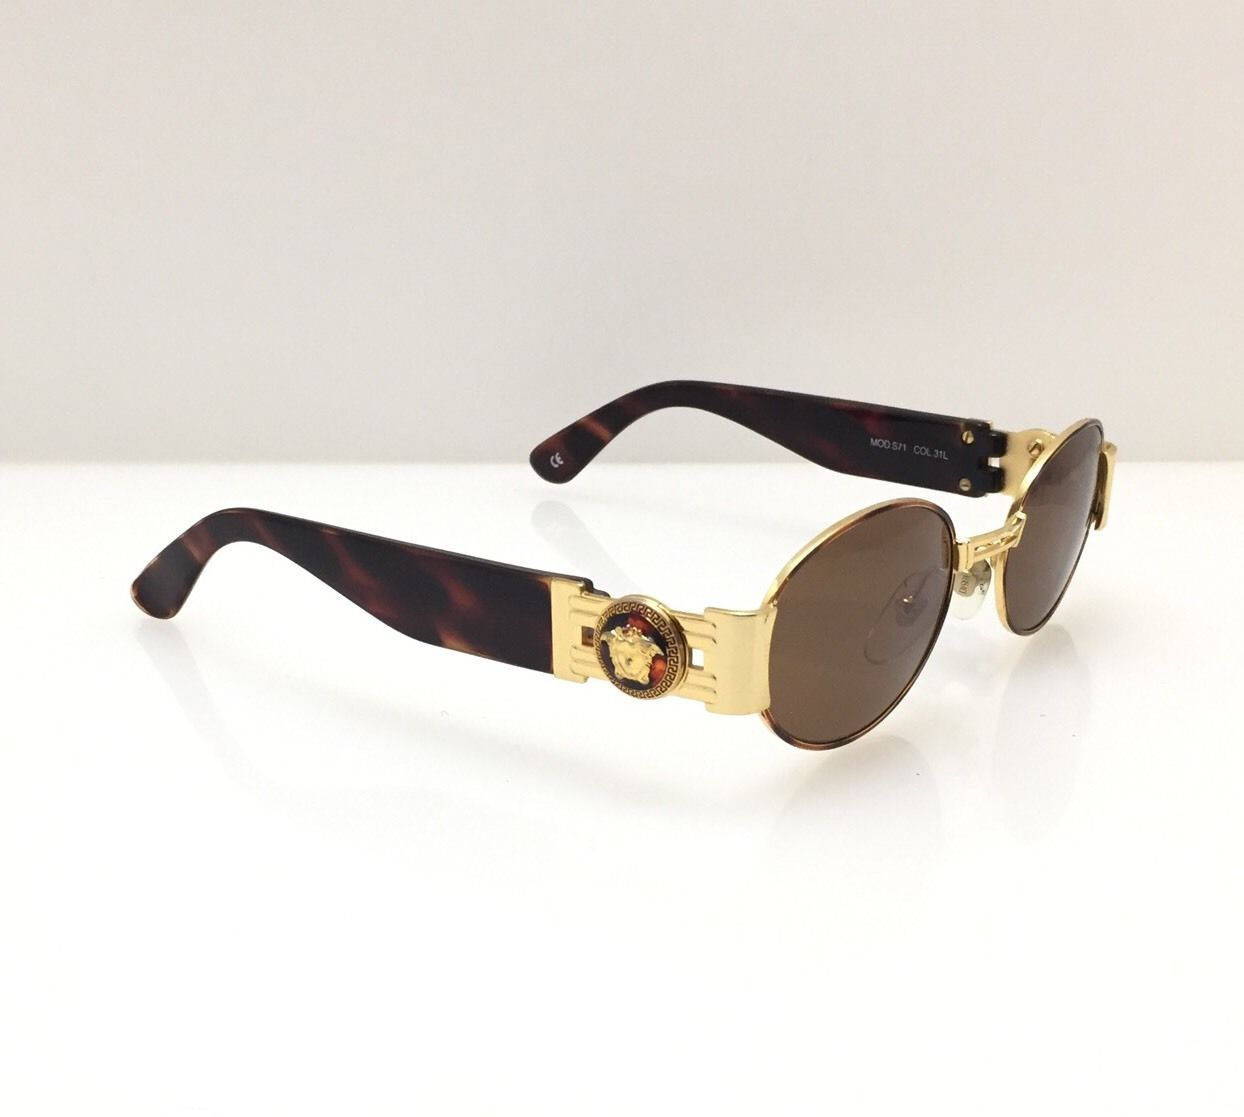 95a645089b00 Gianni Versace Vintage Sunglasses MOD S71 COL 31L Rare Gold Tortoise IFC